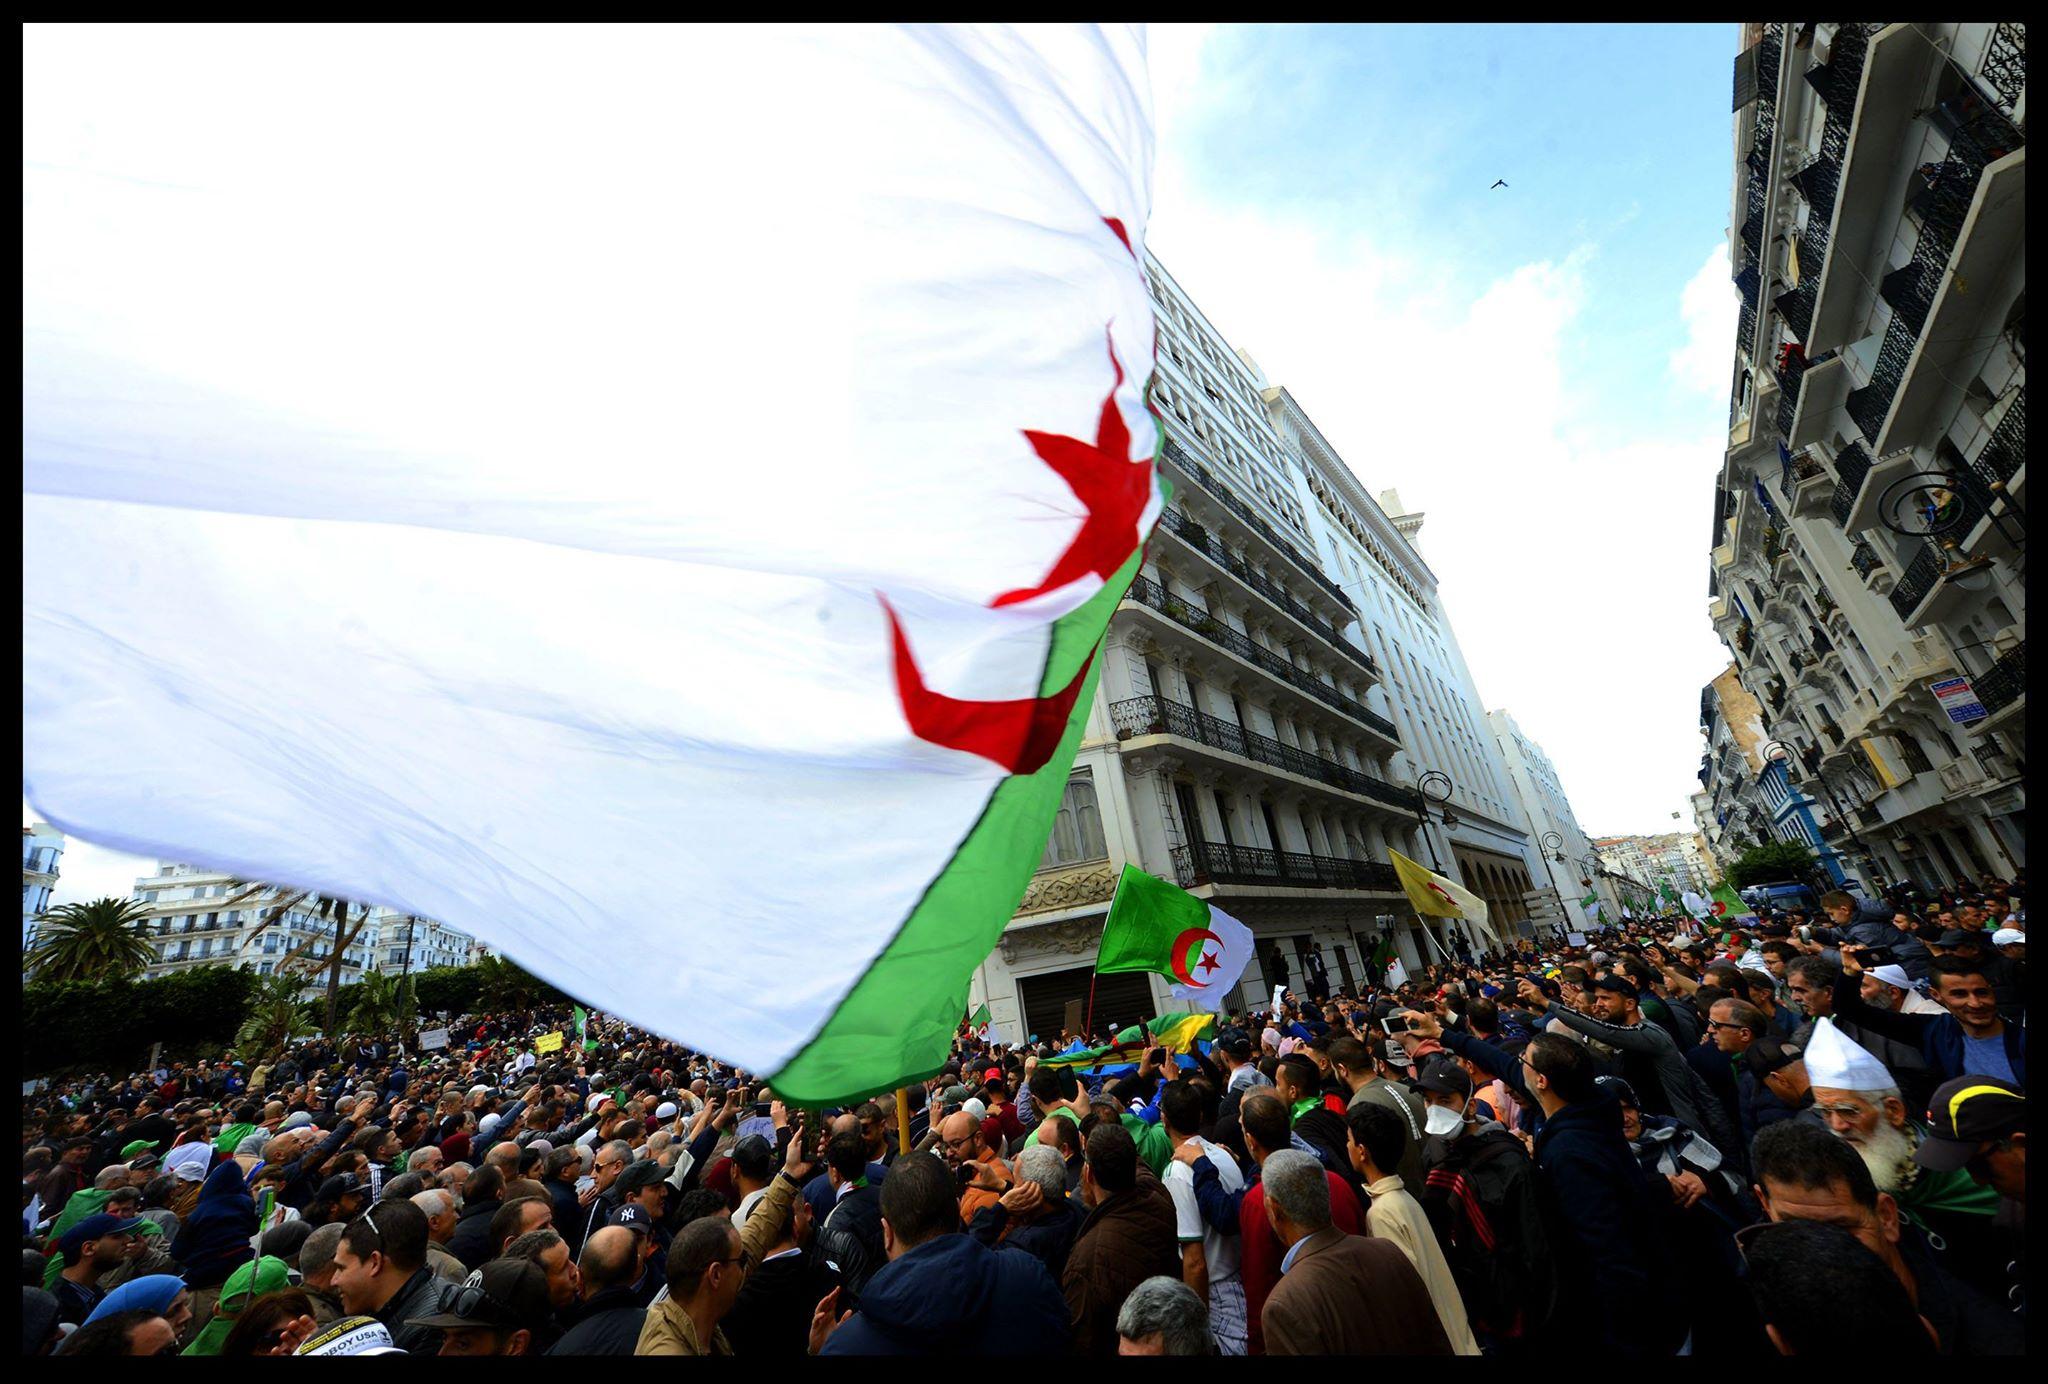 © Sami K | Mobilisation lors du 55e vendredi à Alger